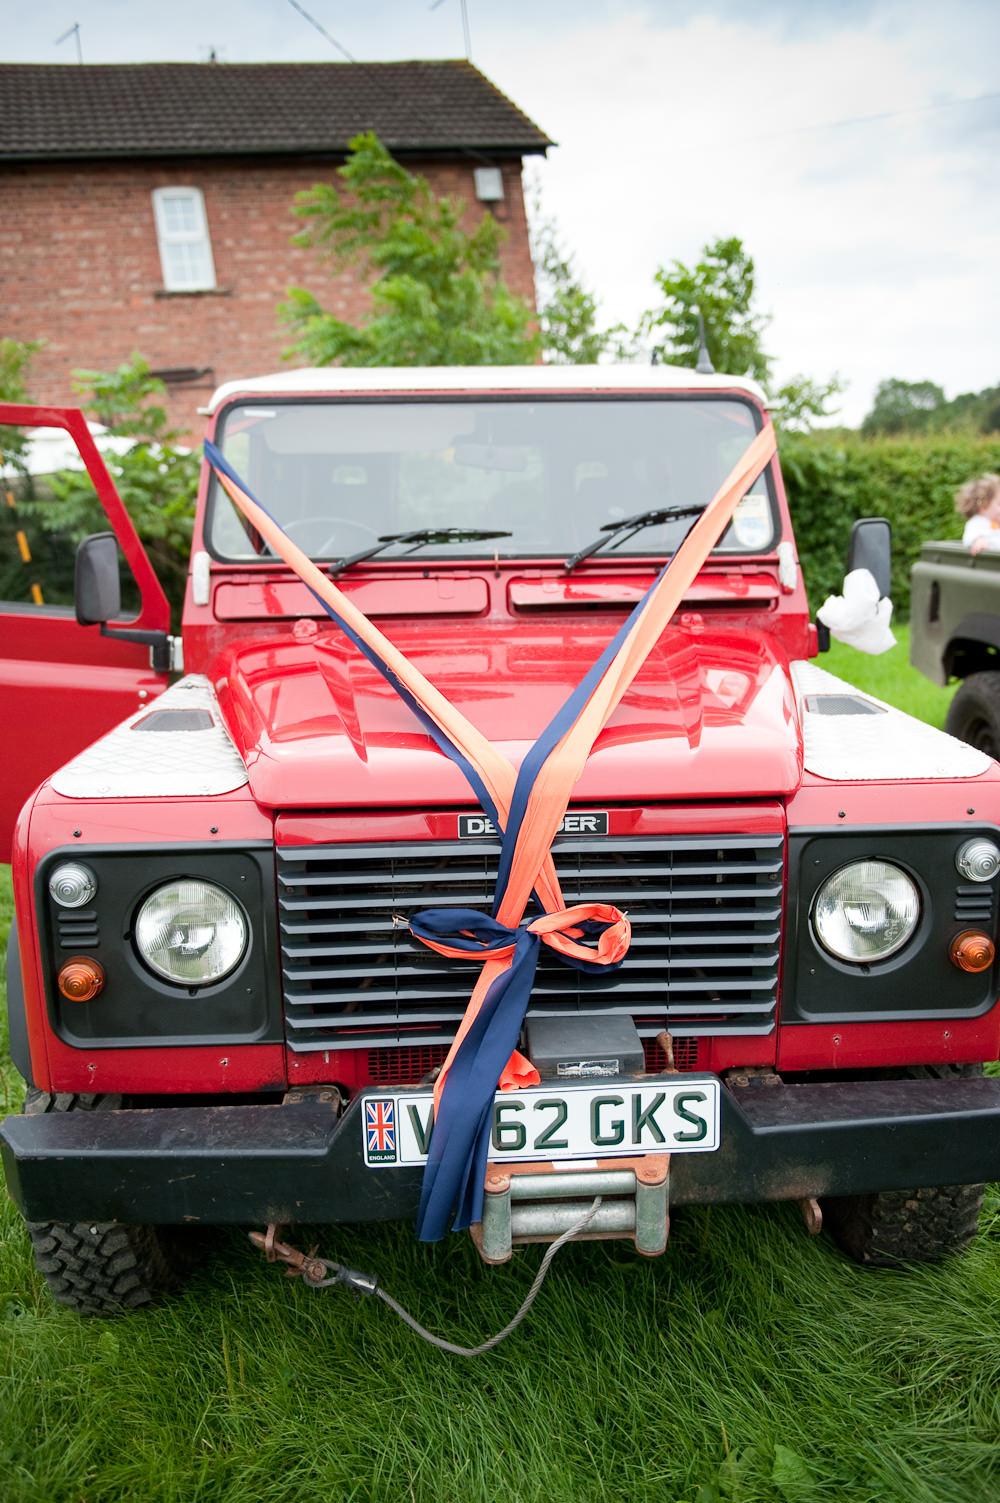 Car Transport Land Rover Defenders Floral Wedding Rachael Connerton Photography